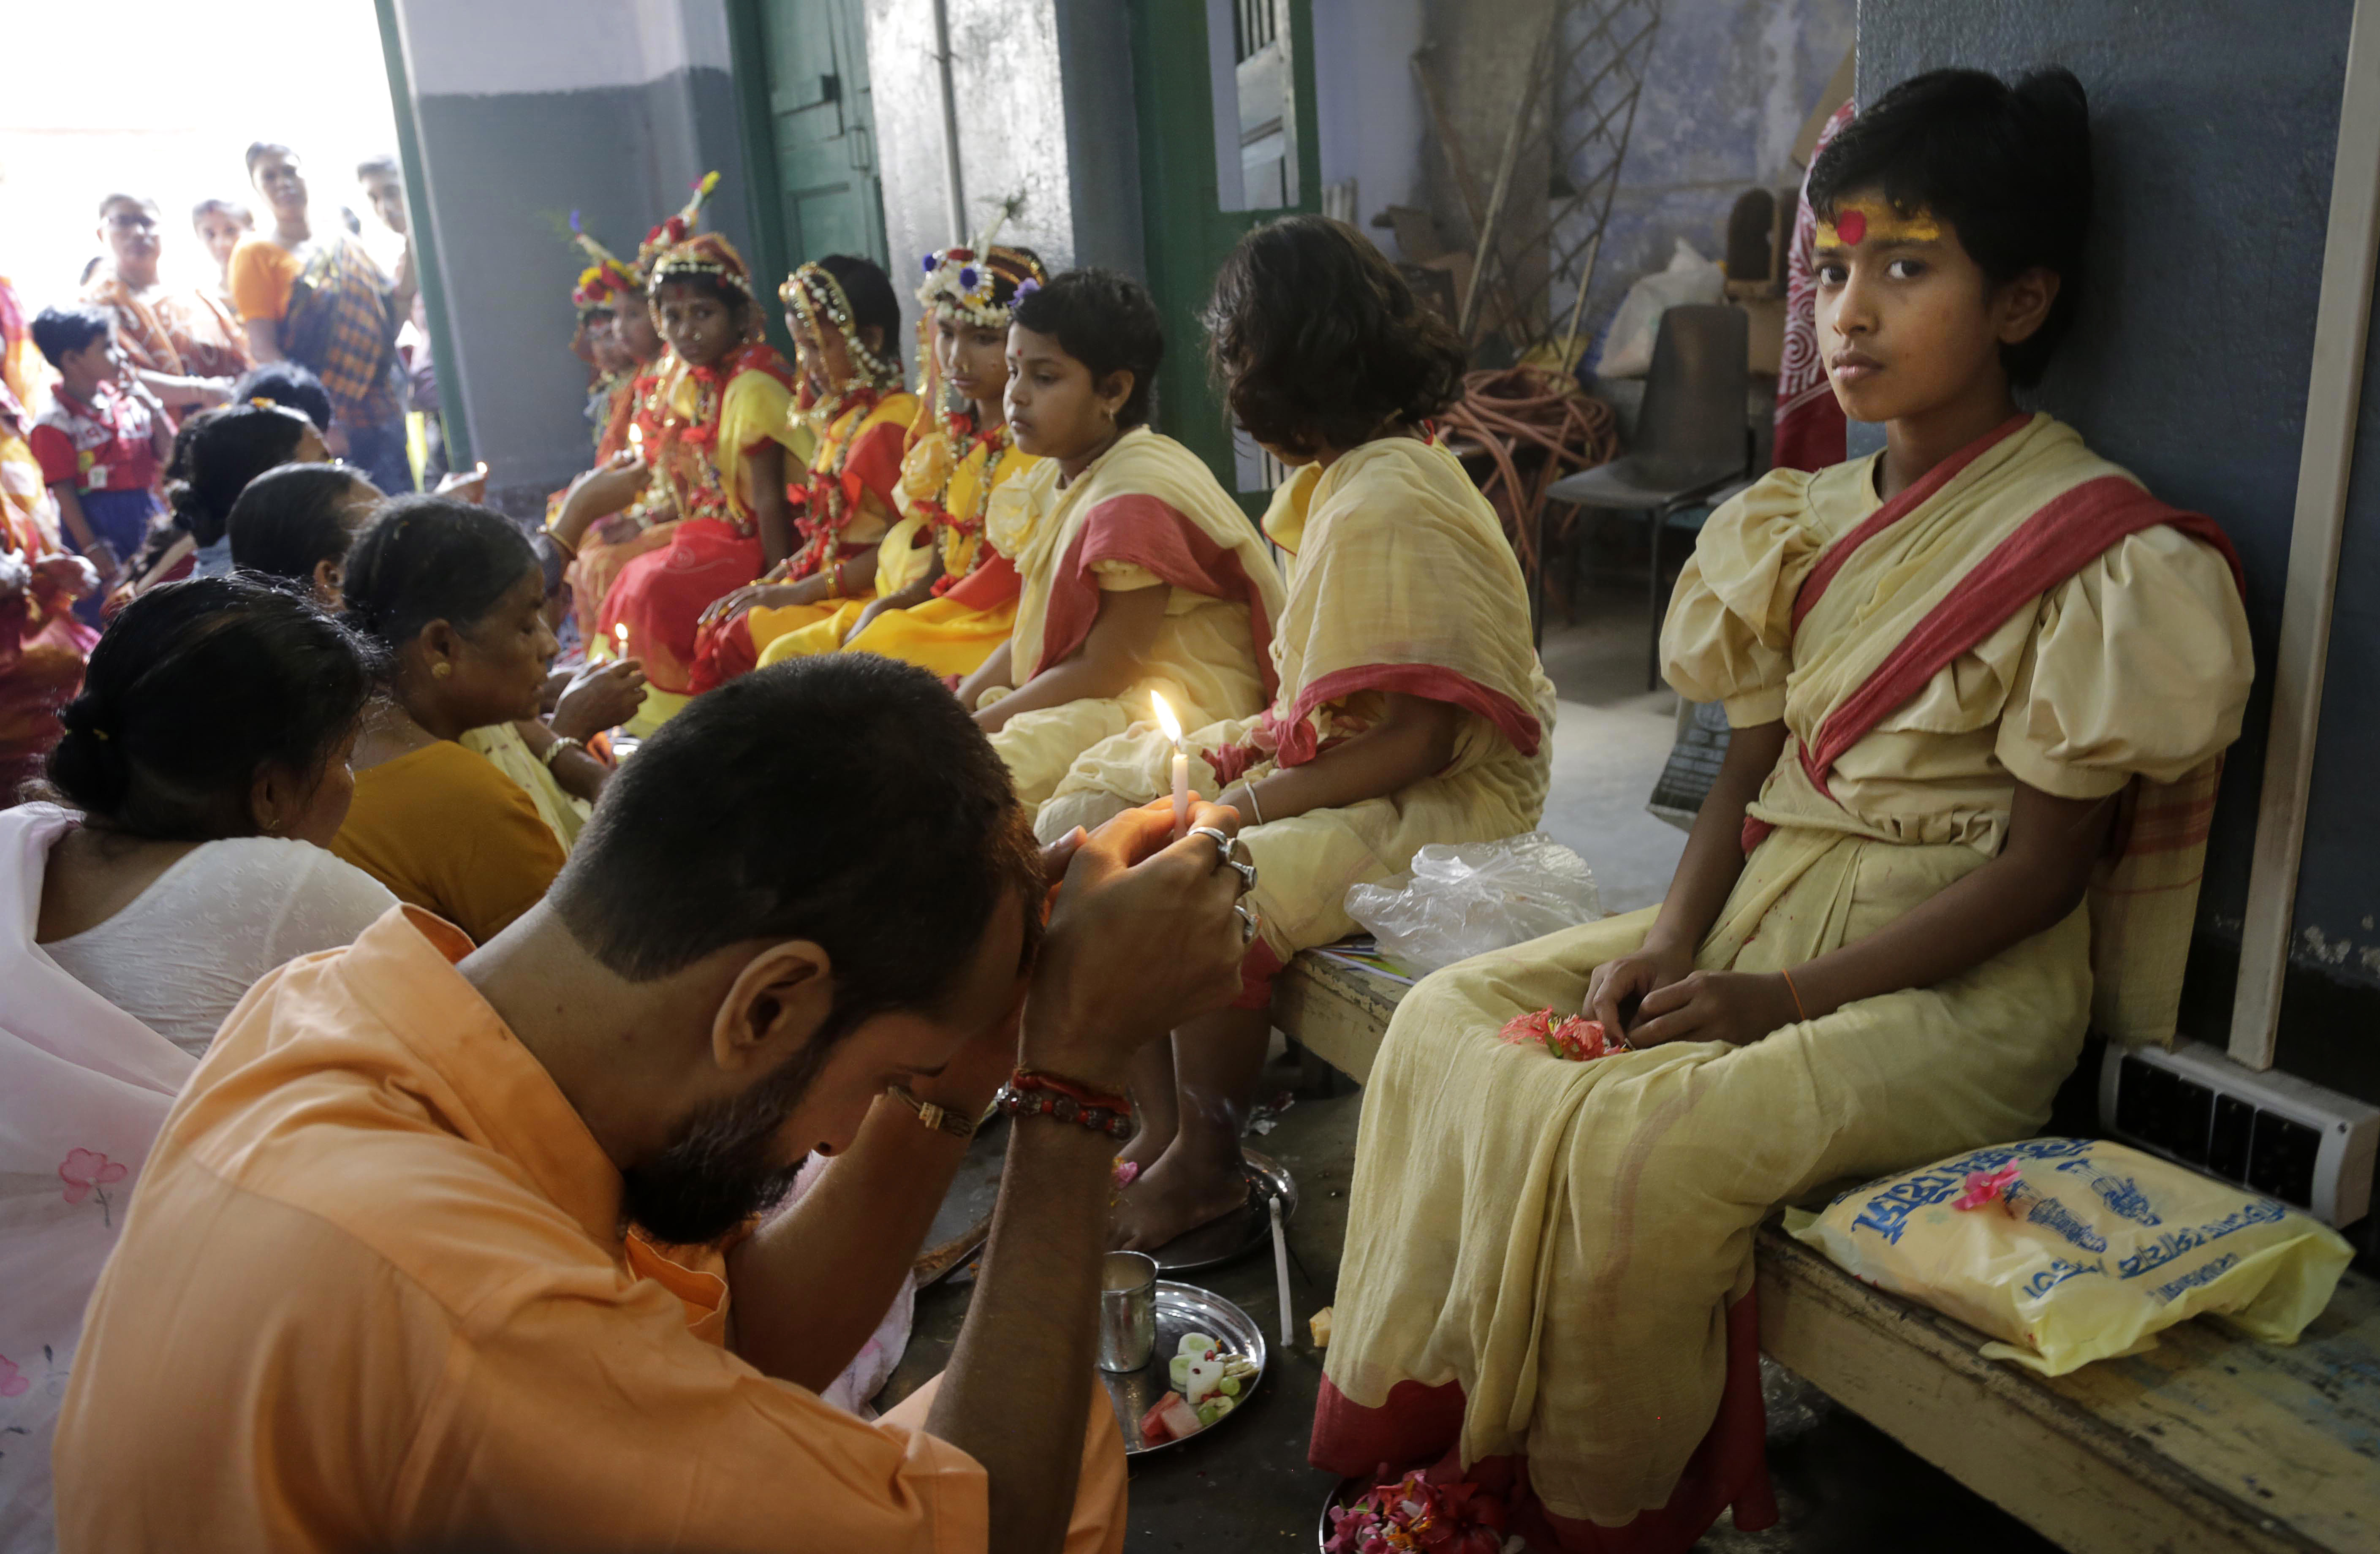 ffe3d8676e05 Και όμως υπάρχουν  Τα 10 πιο παράξενα έθιμα γάμου από όλο τον κόσμο ...